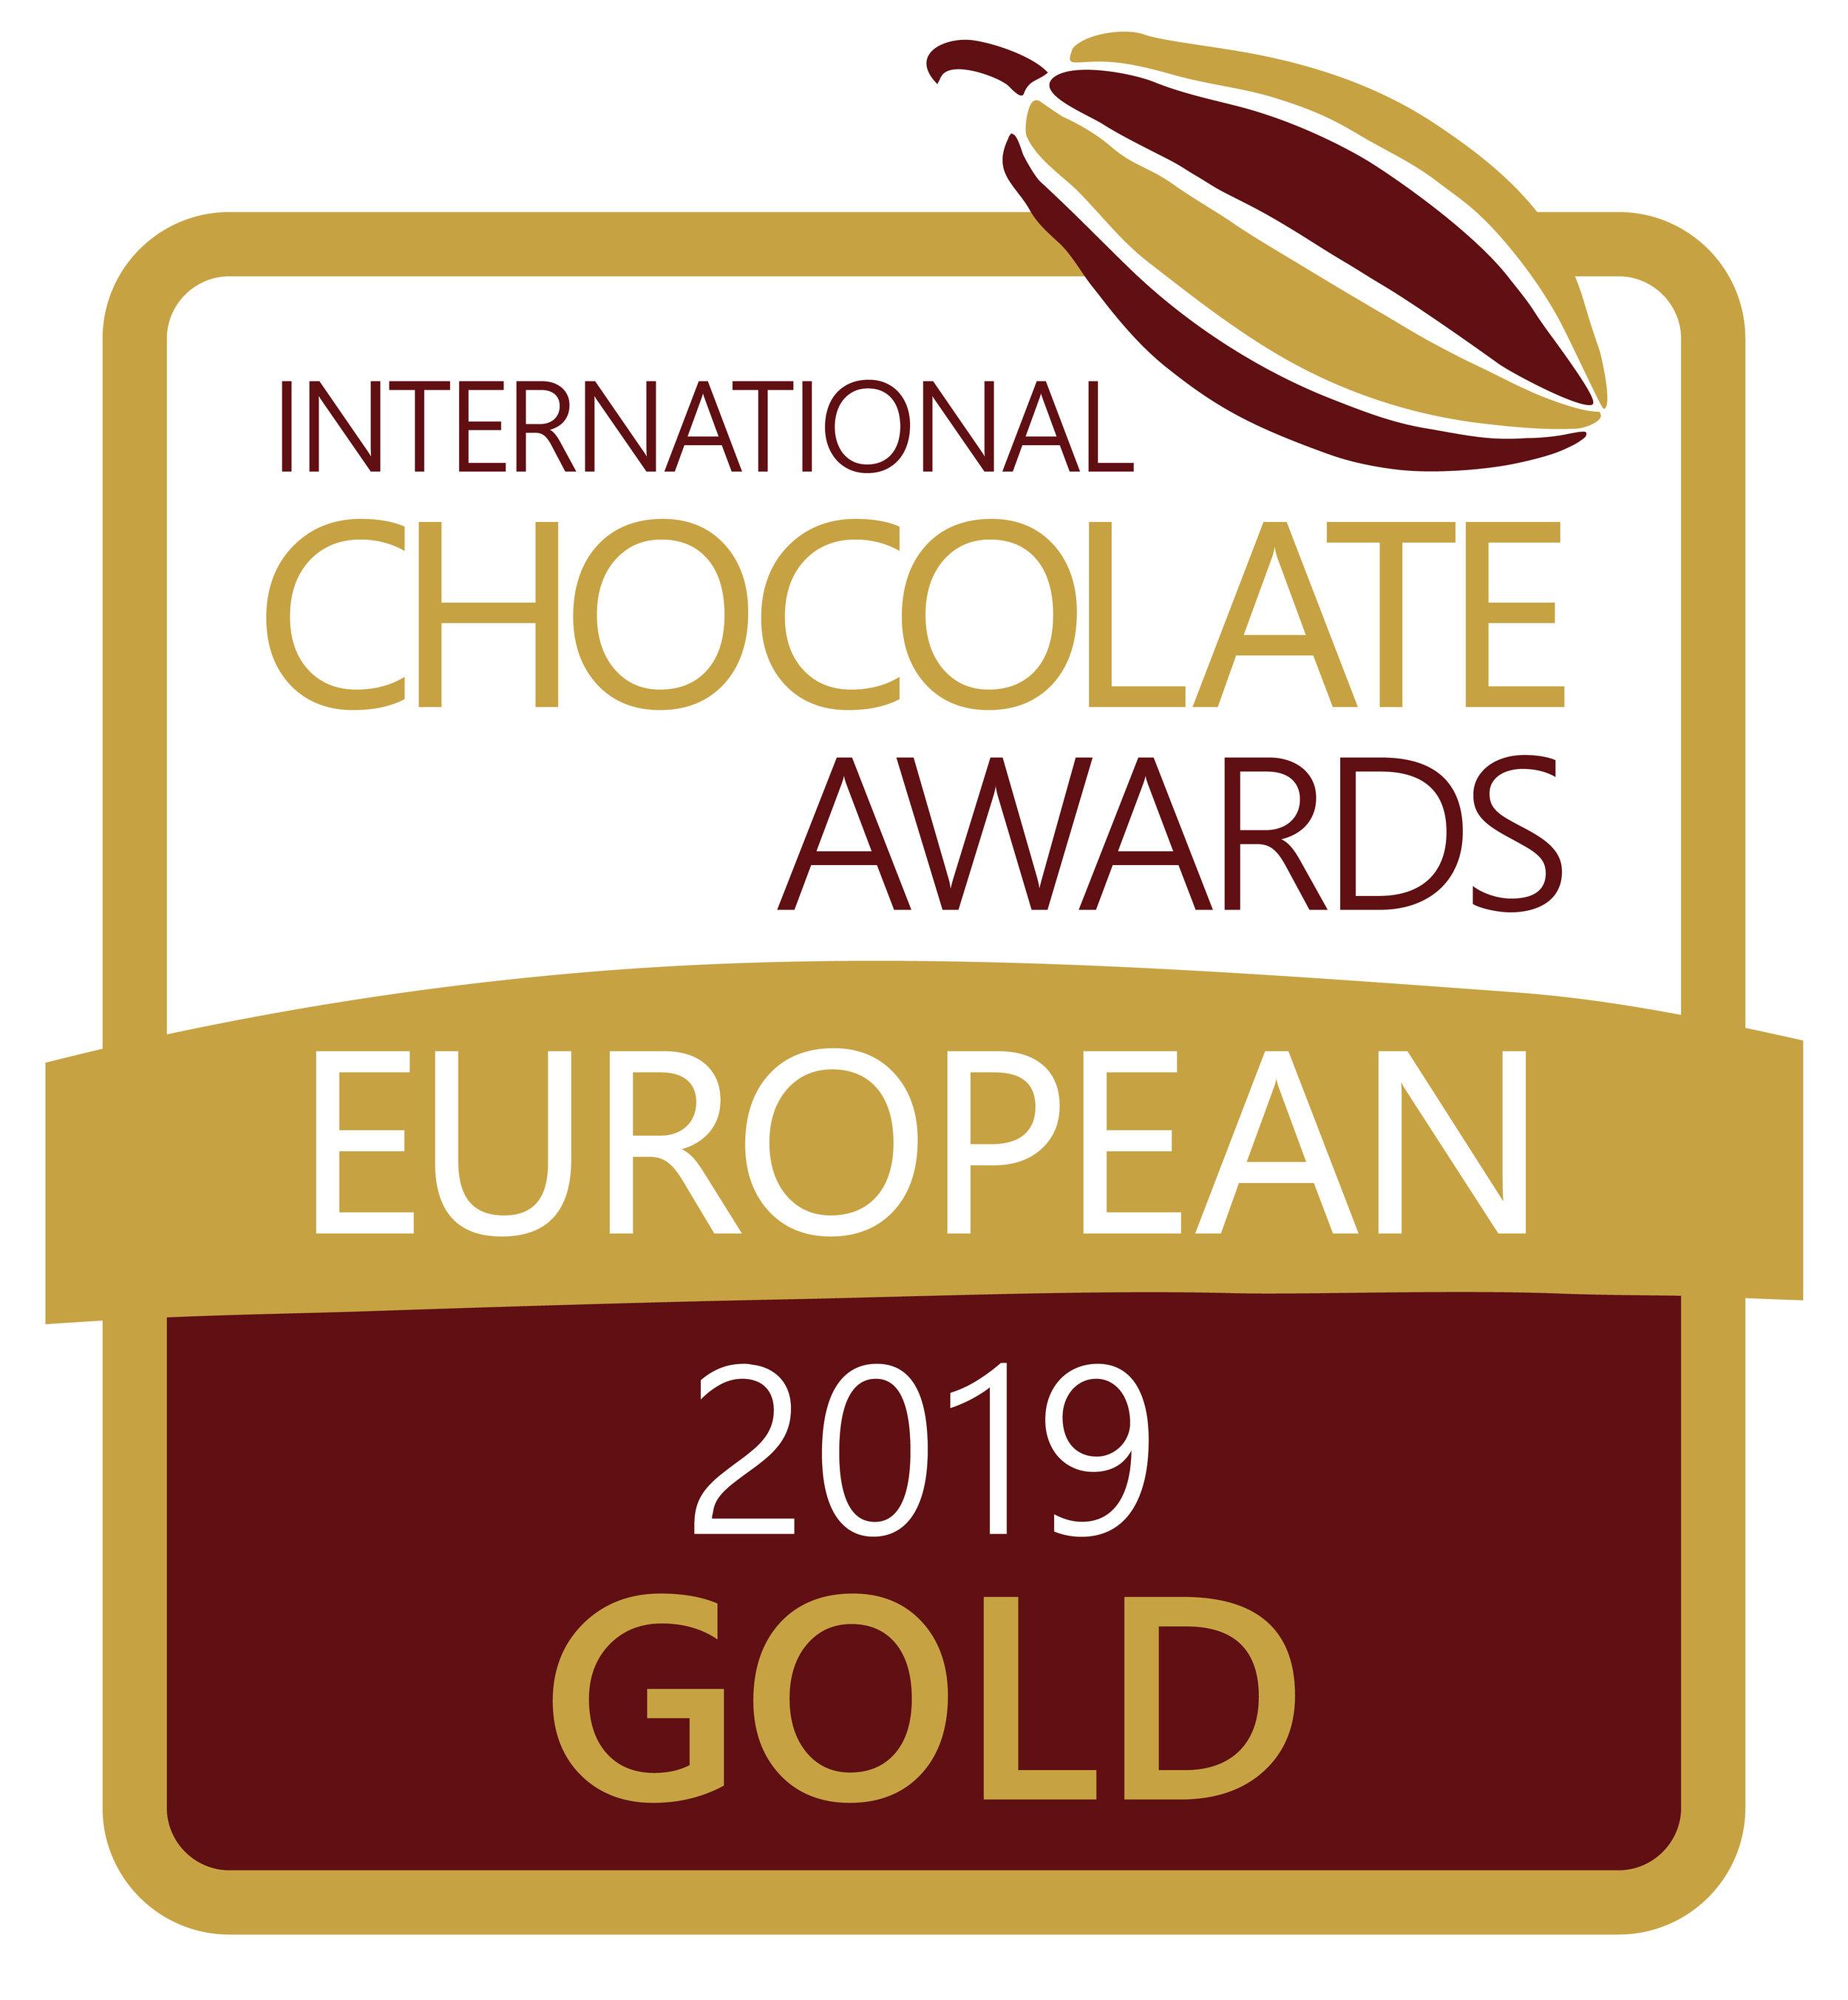 ica-prize-logo-2019-gold-euro-rgb.jpg